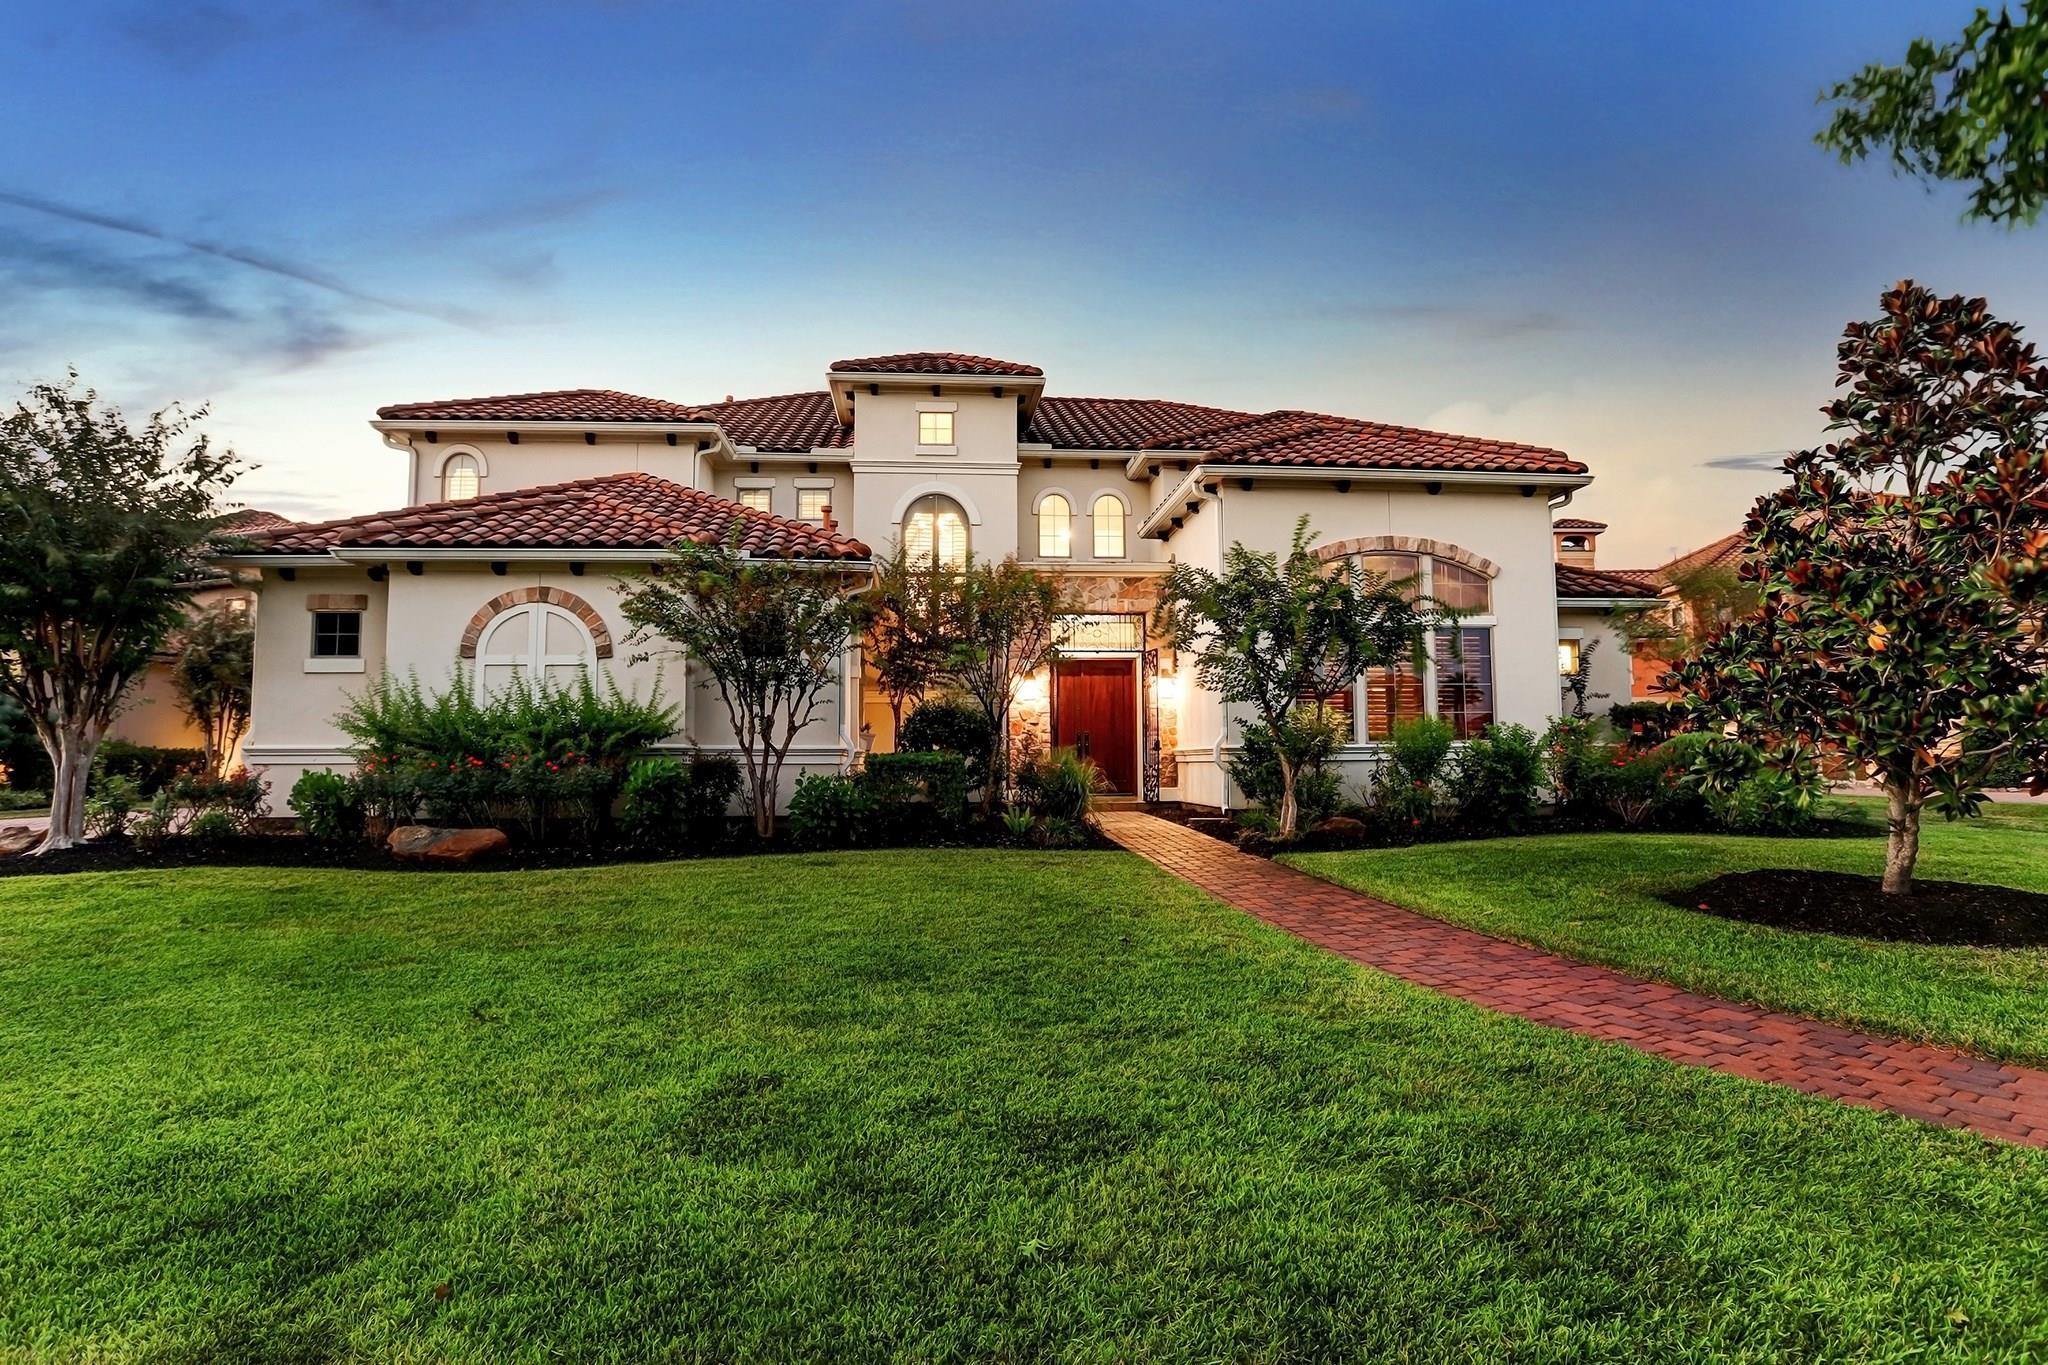 2206 CAPRI ISLE Court Property Photo - Houston, TX real estate listing